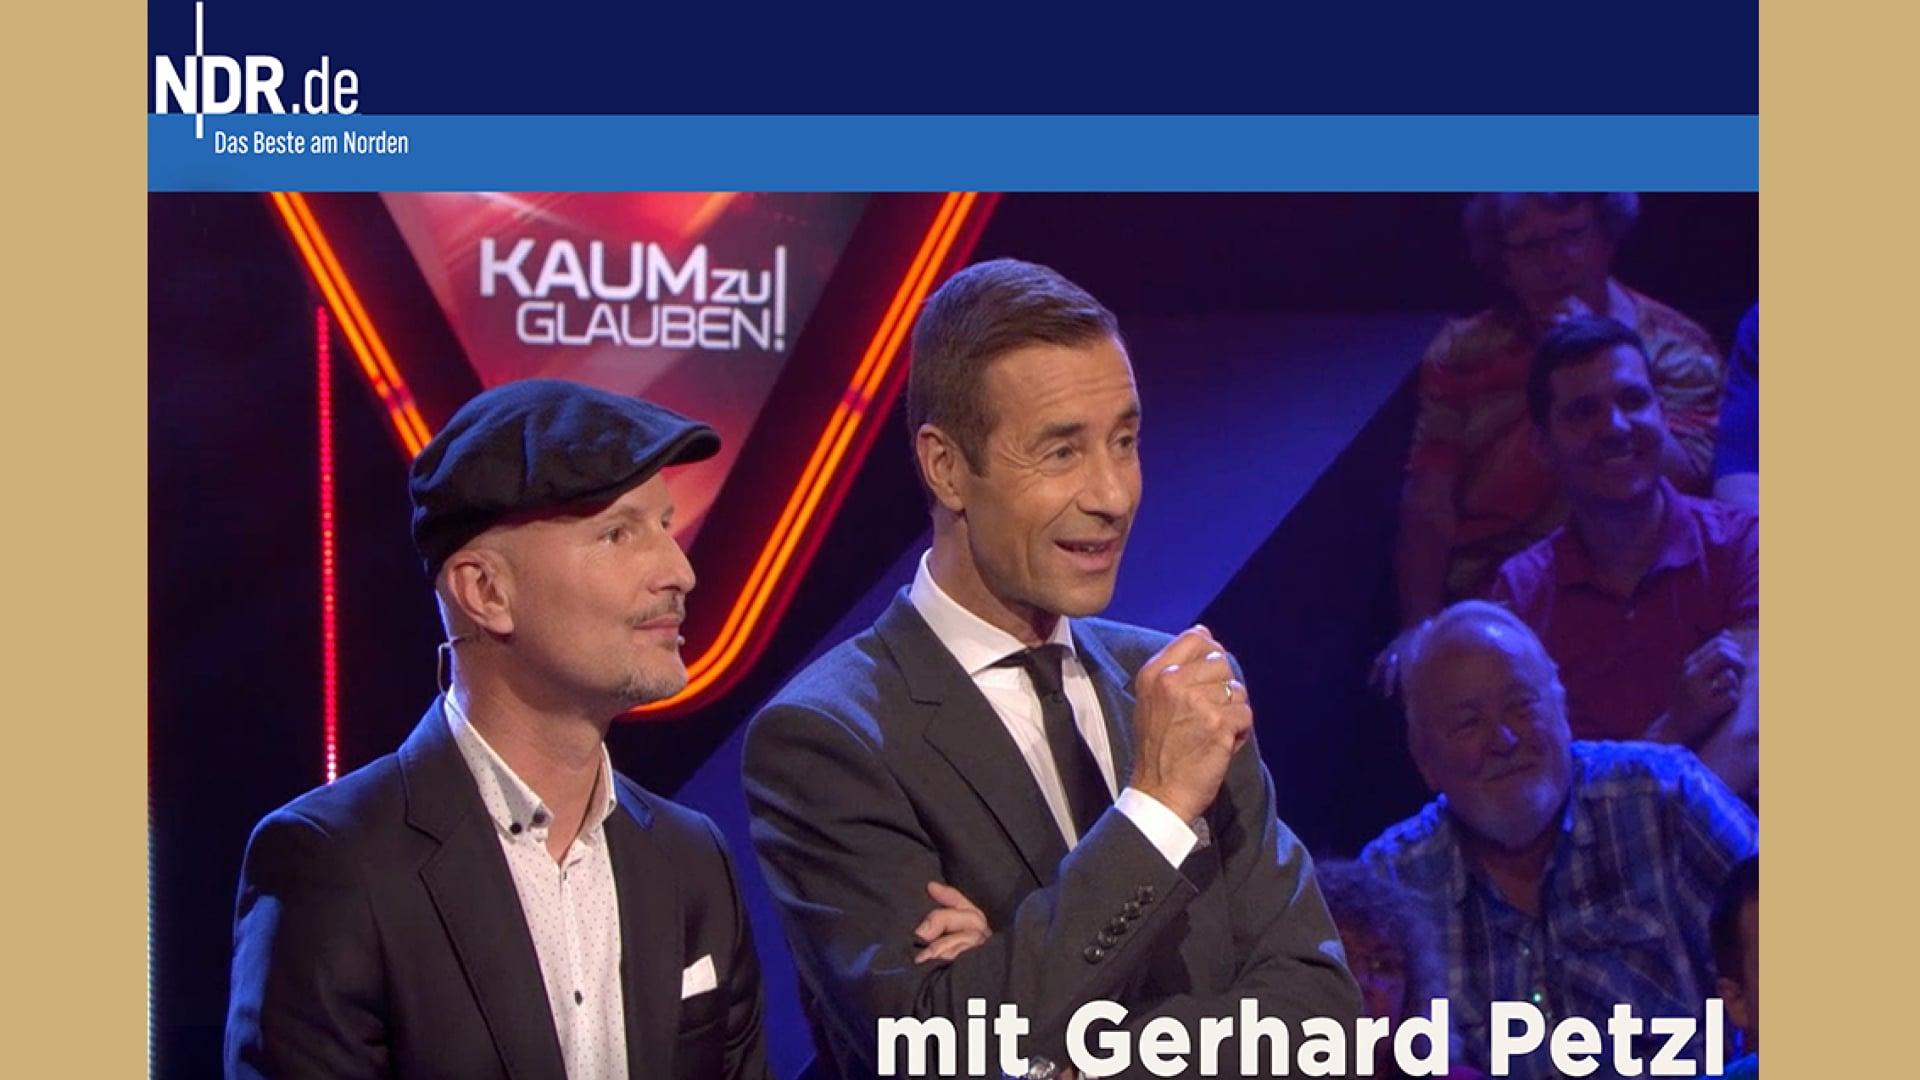 TV-NDR: Gerhard Petzl zu Gast im Studio bei Kai Pflaume